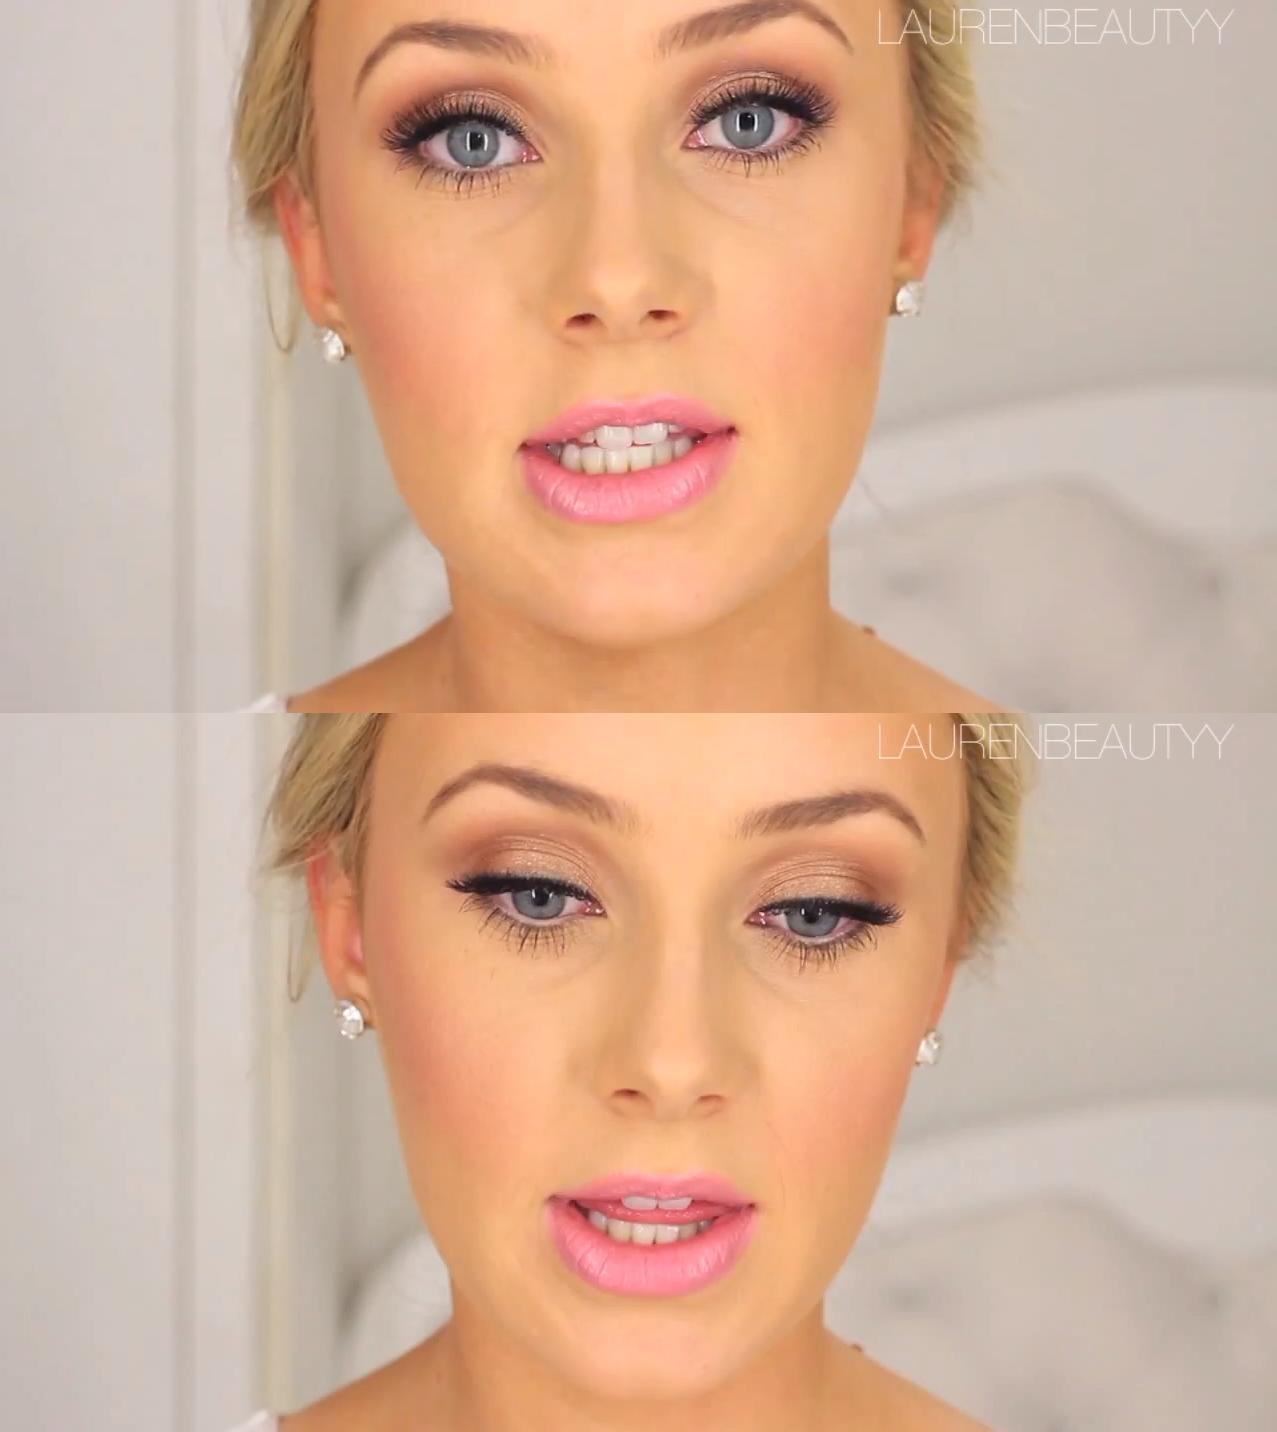 bridal makeup by laurenbeautyy | wedding makeup | pinterest